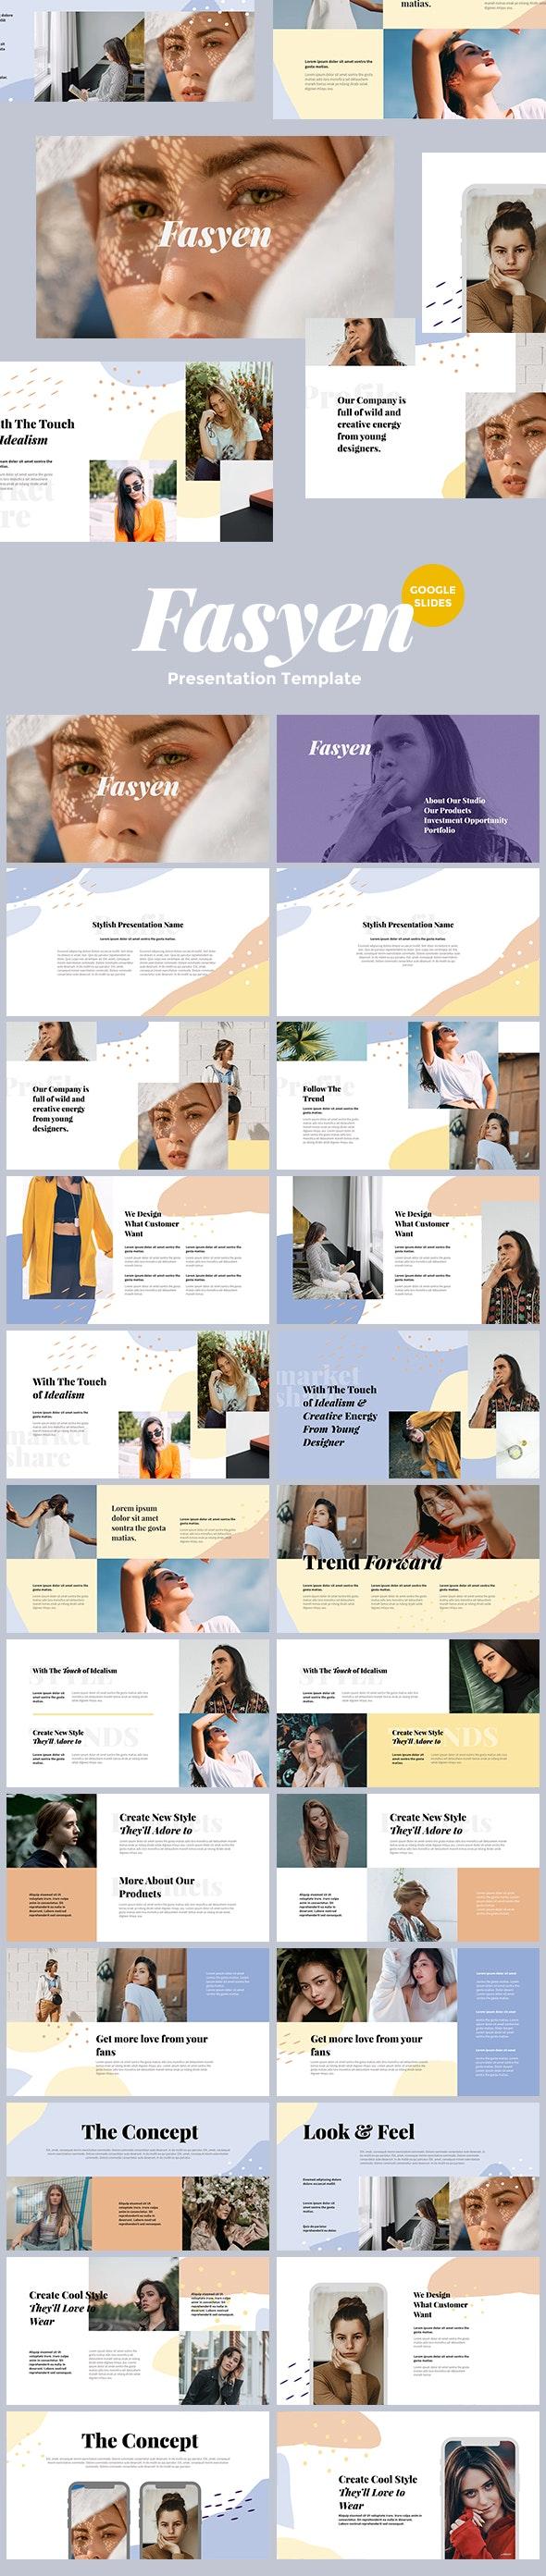 Fasyen - Google Slides Template Presentation - Google Slides Presentation Templates